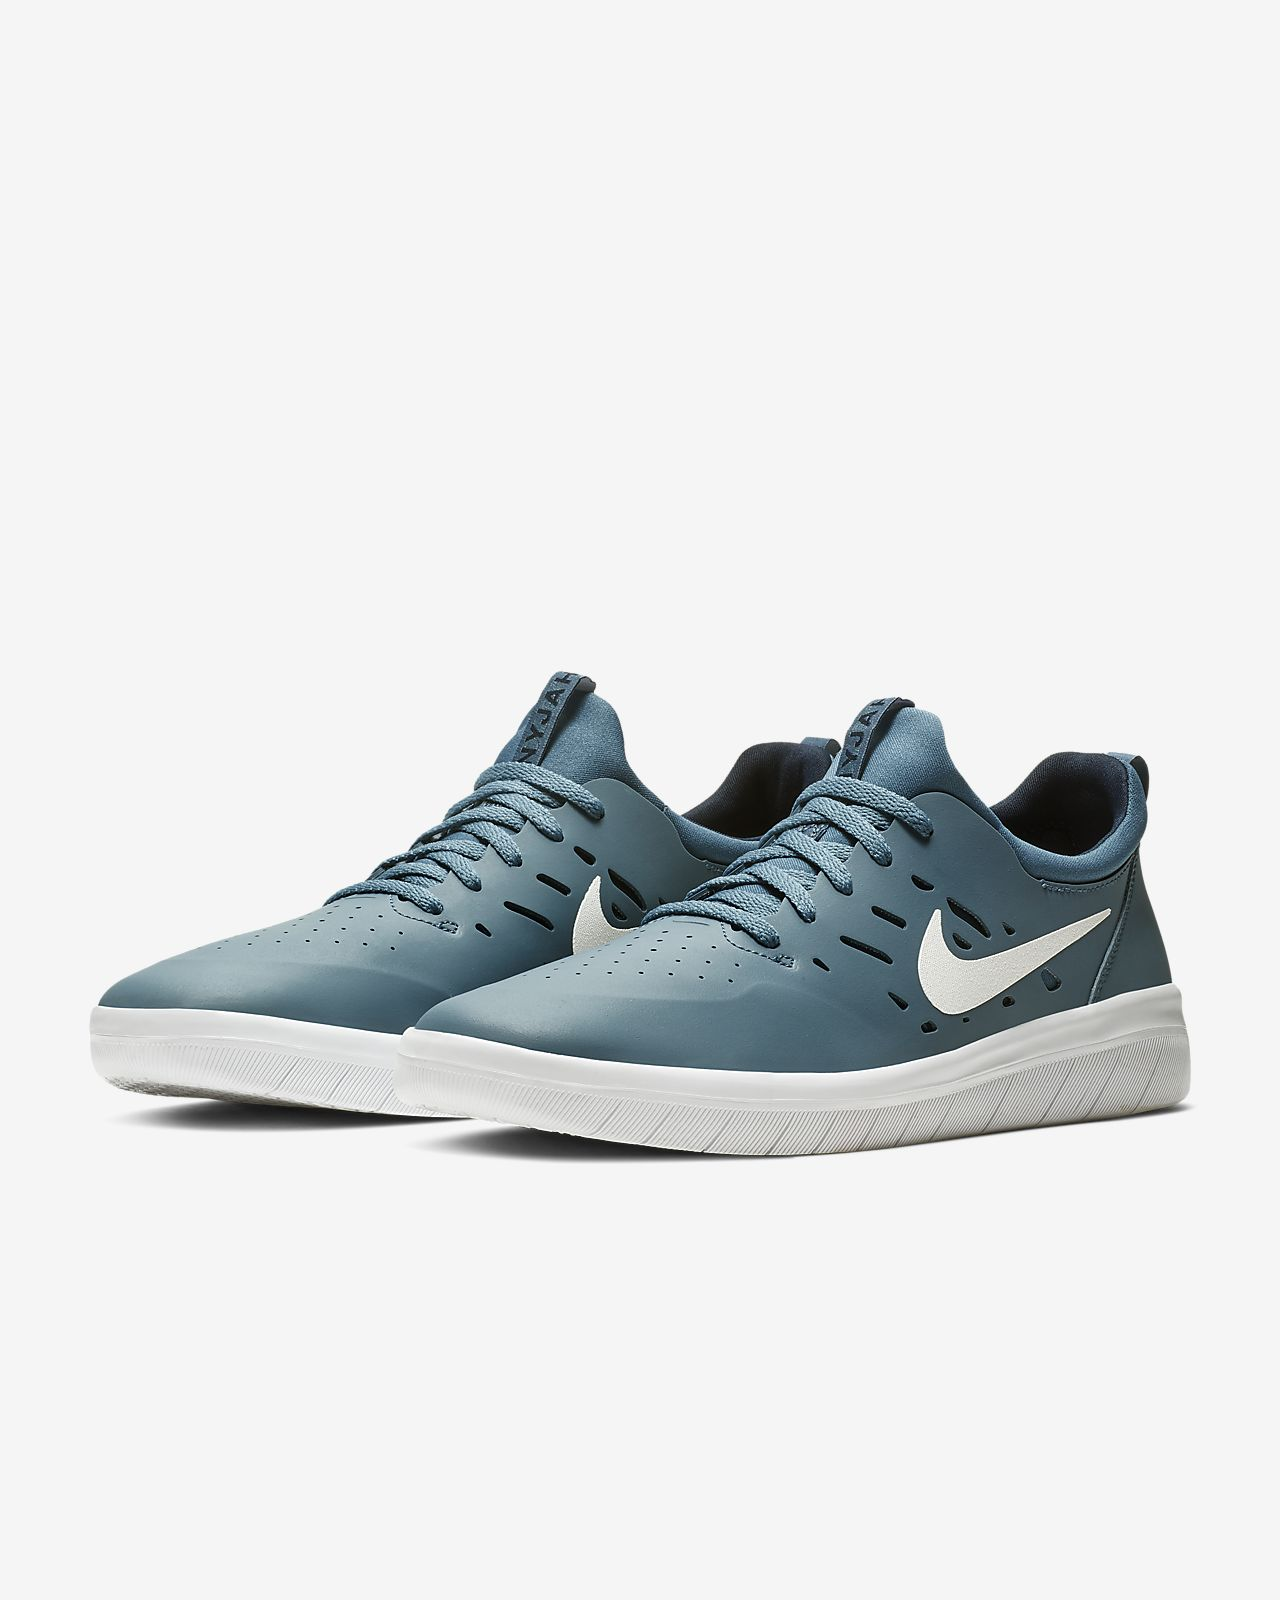 f94de0632d37e0 Nike SB Nyjah Free Skate Shoe. Nike.com GB